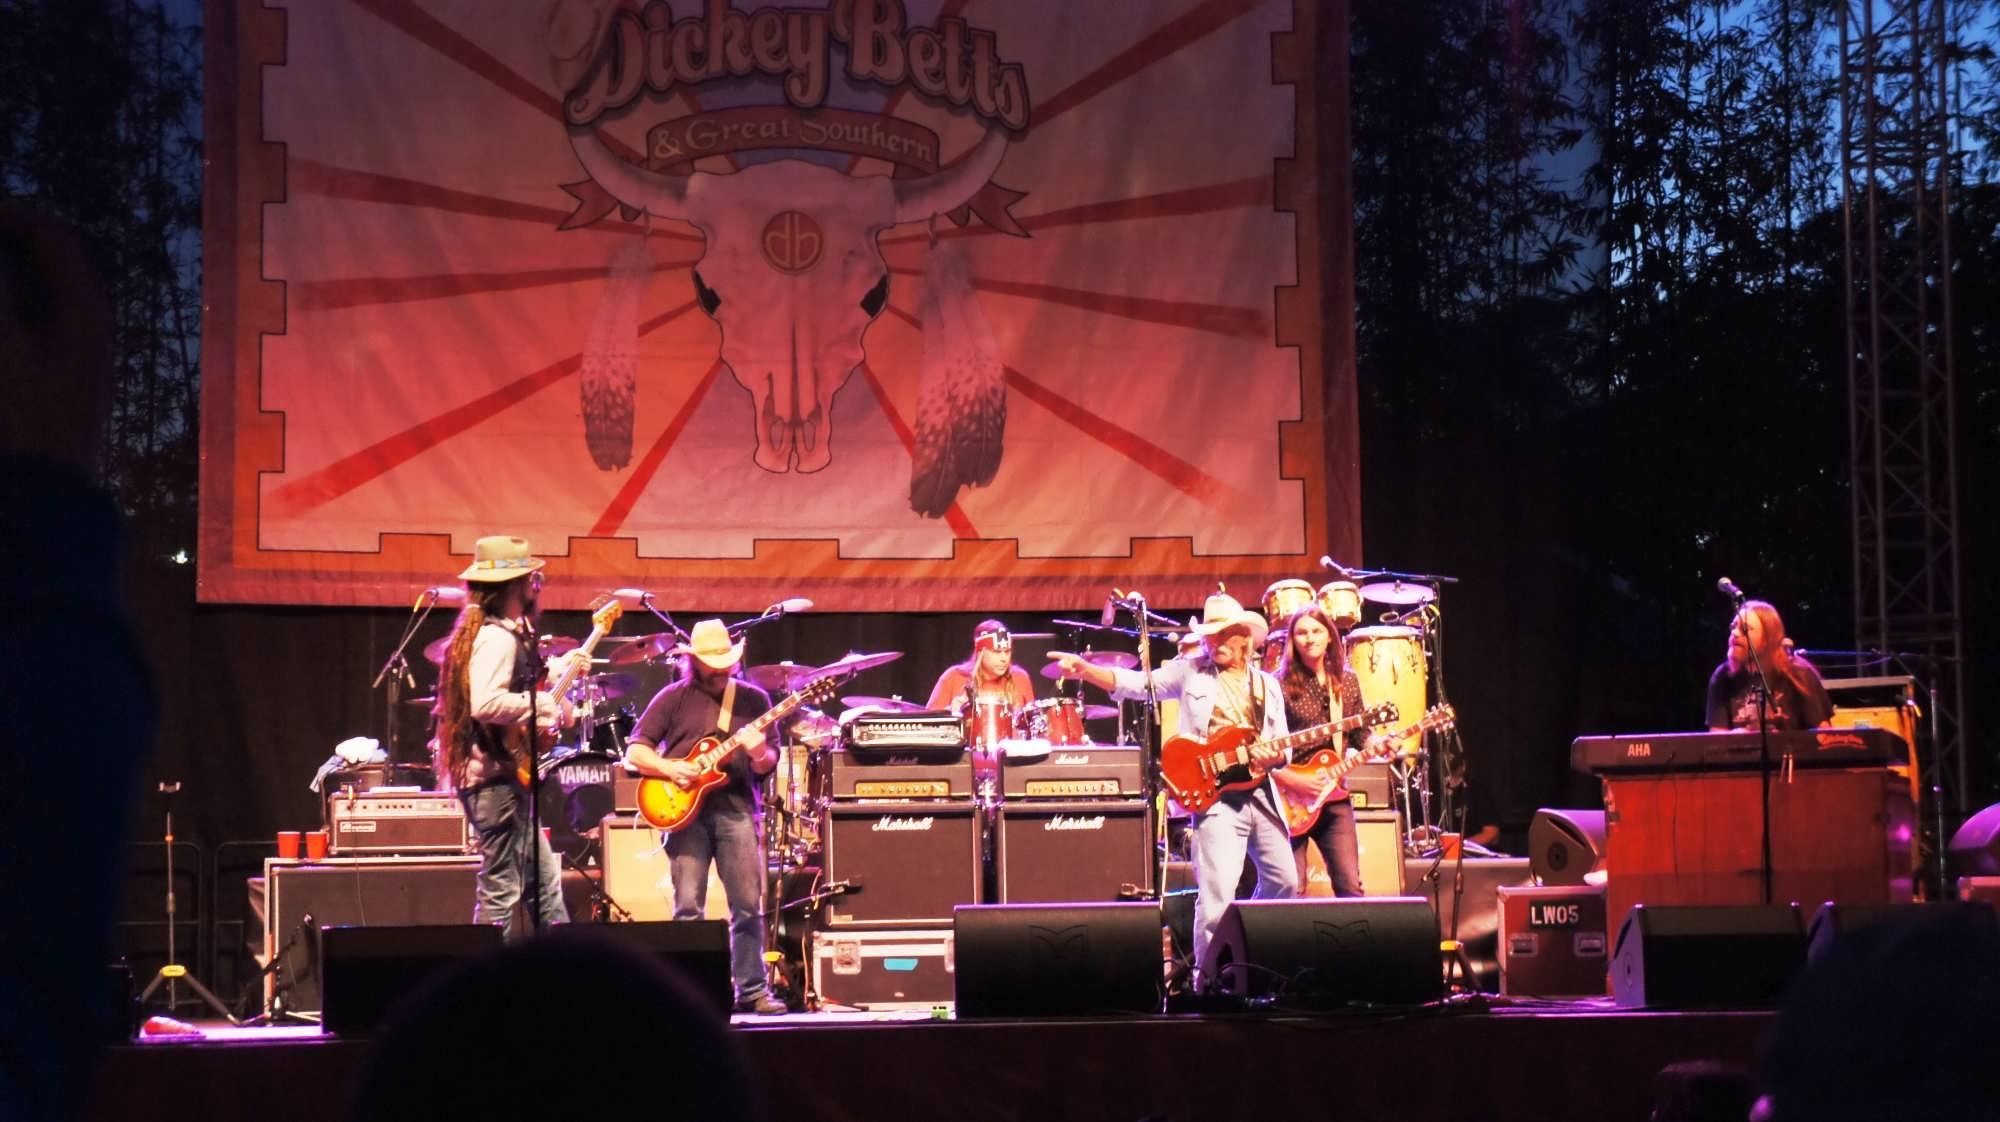 Busch Gardens Tampa trip report – February 2014 Bands Brew & BBQ